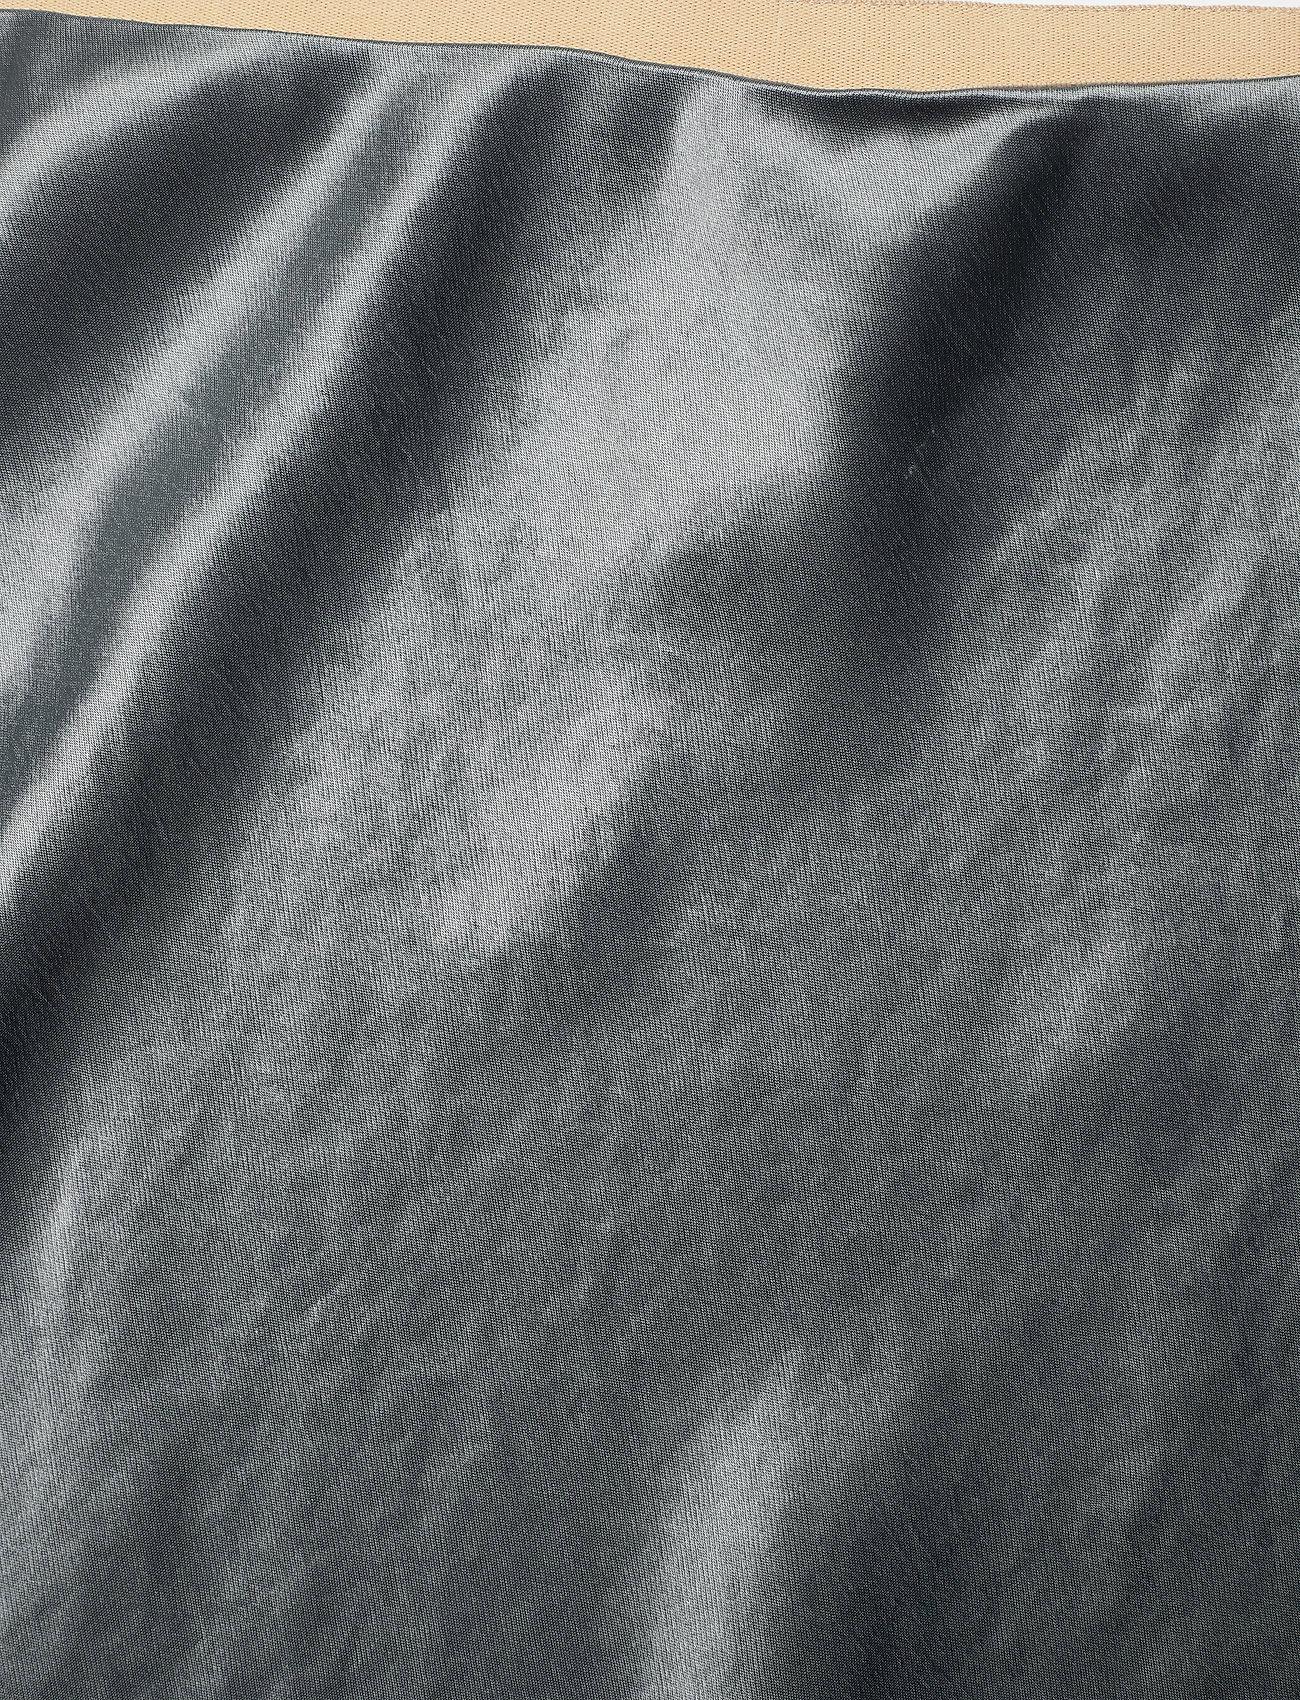 Max Mara Leisure - ALESSIO - midi skirts - medium grey - 2